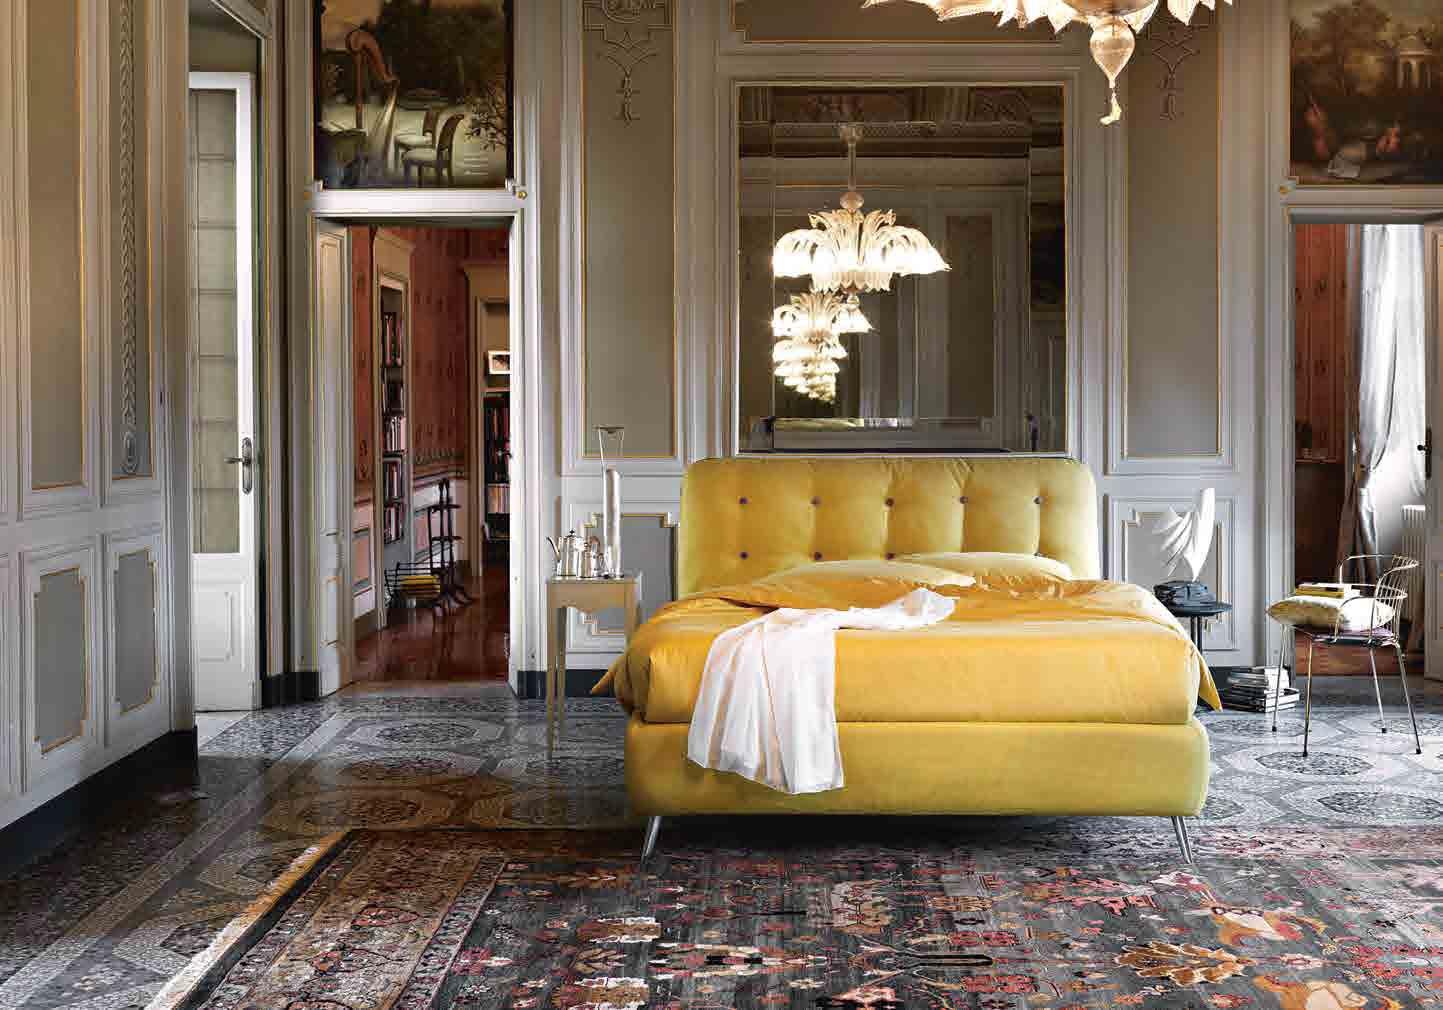 cabeceros-tapizados-general-muebles-paco-caballero-1811-5cdfdff532544